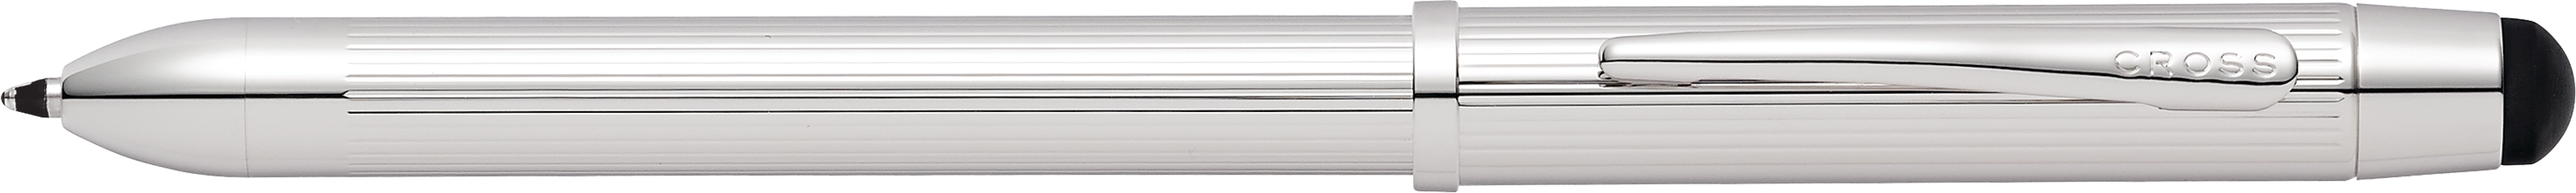 Tech3+ Platinum Plated Multifunction Pen